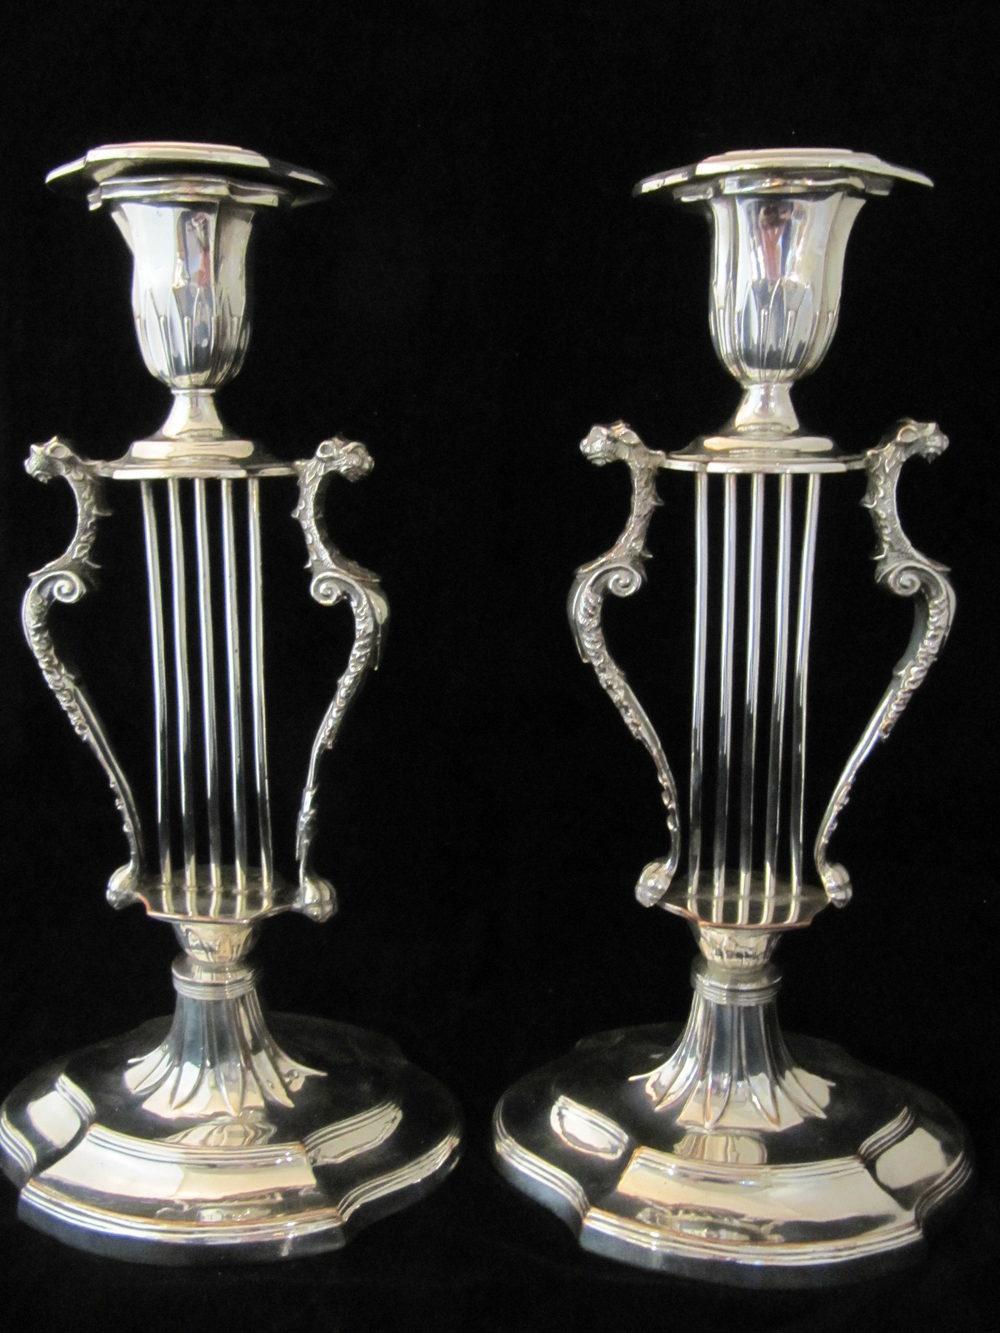 Antiques Atlas - Antique Sheffield Plate Candlesticks